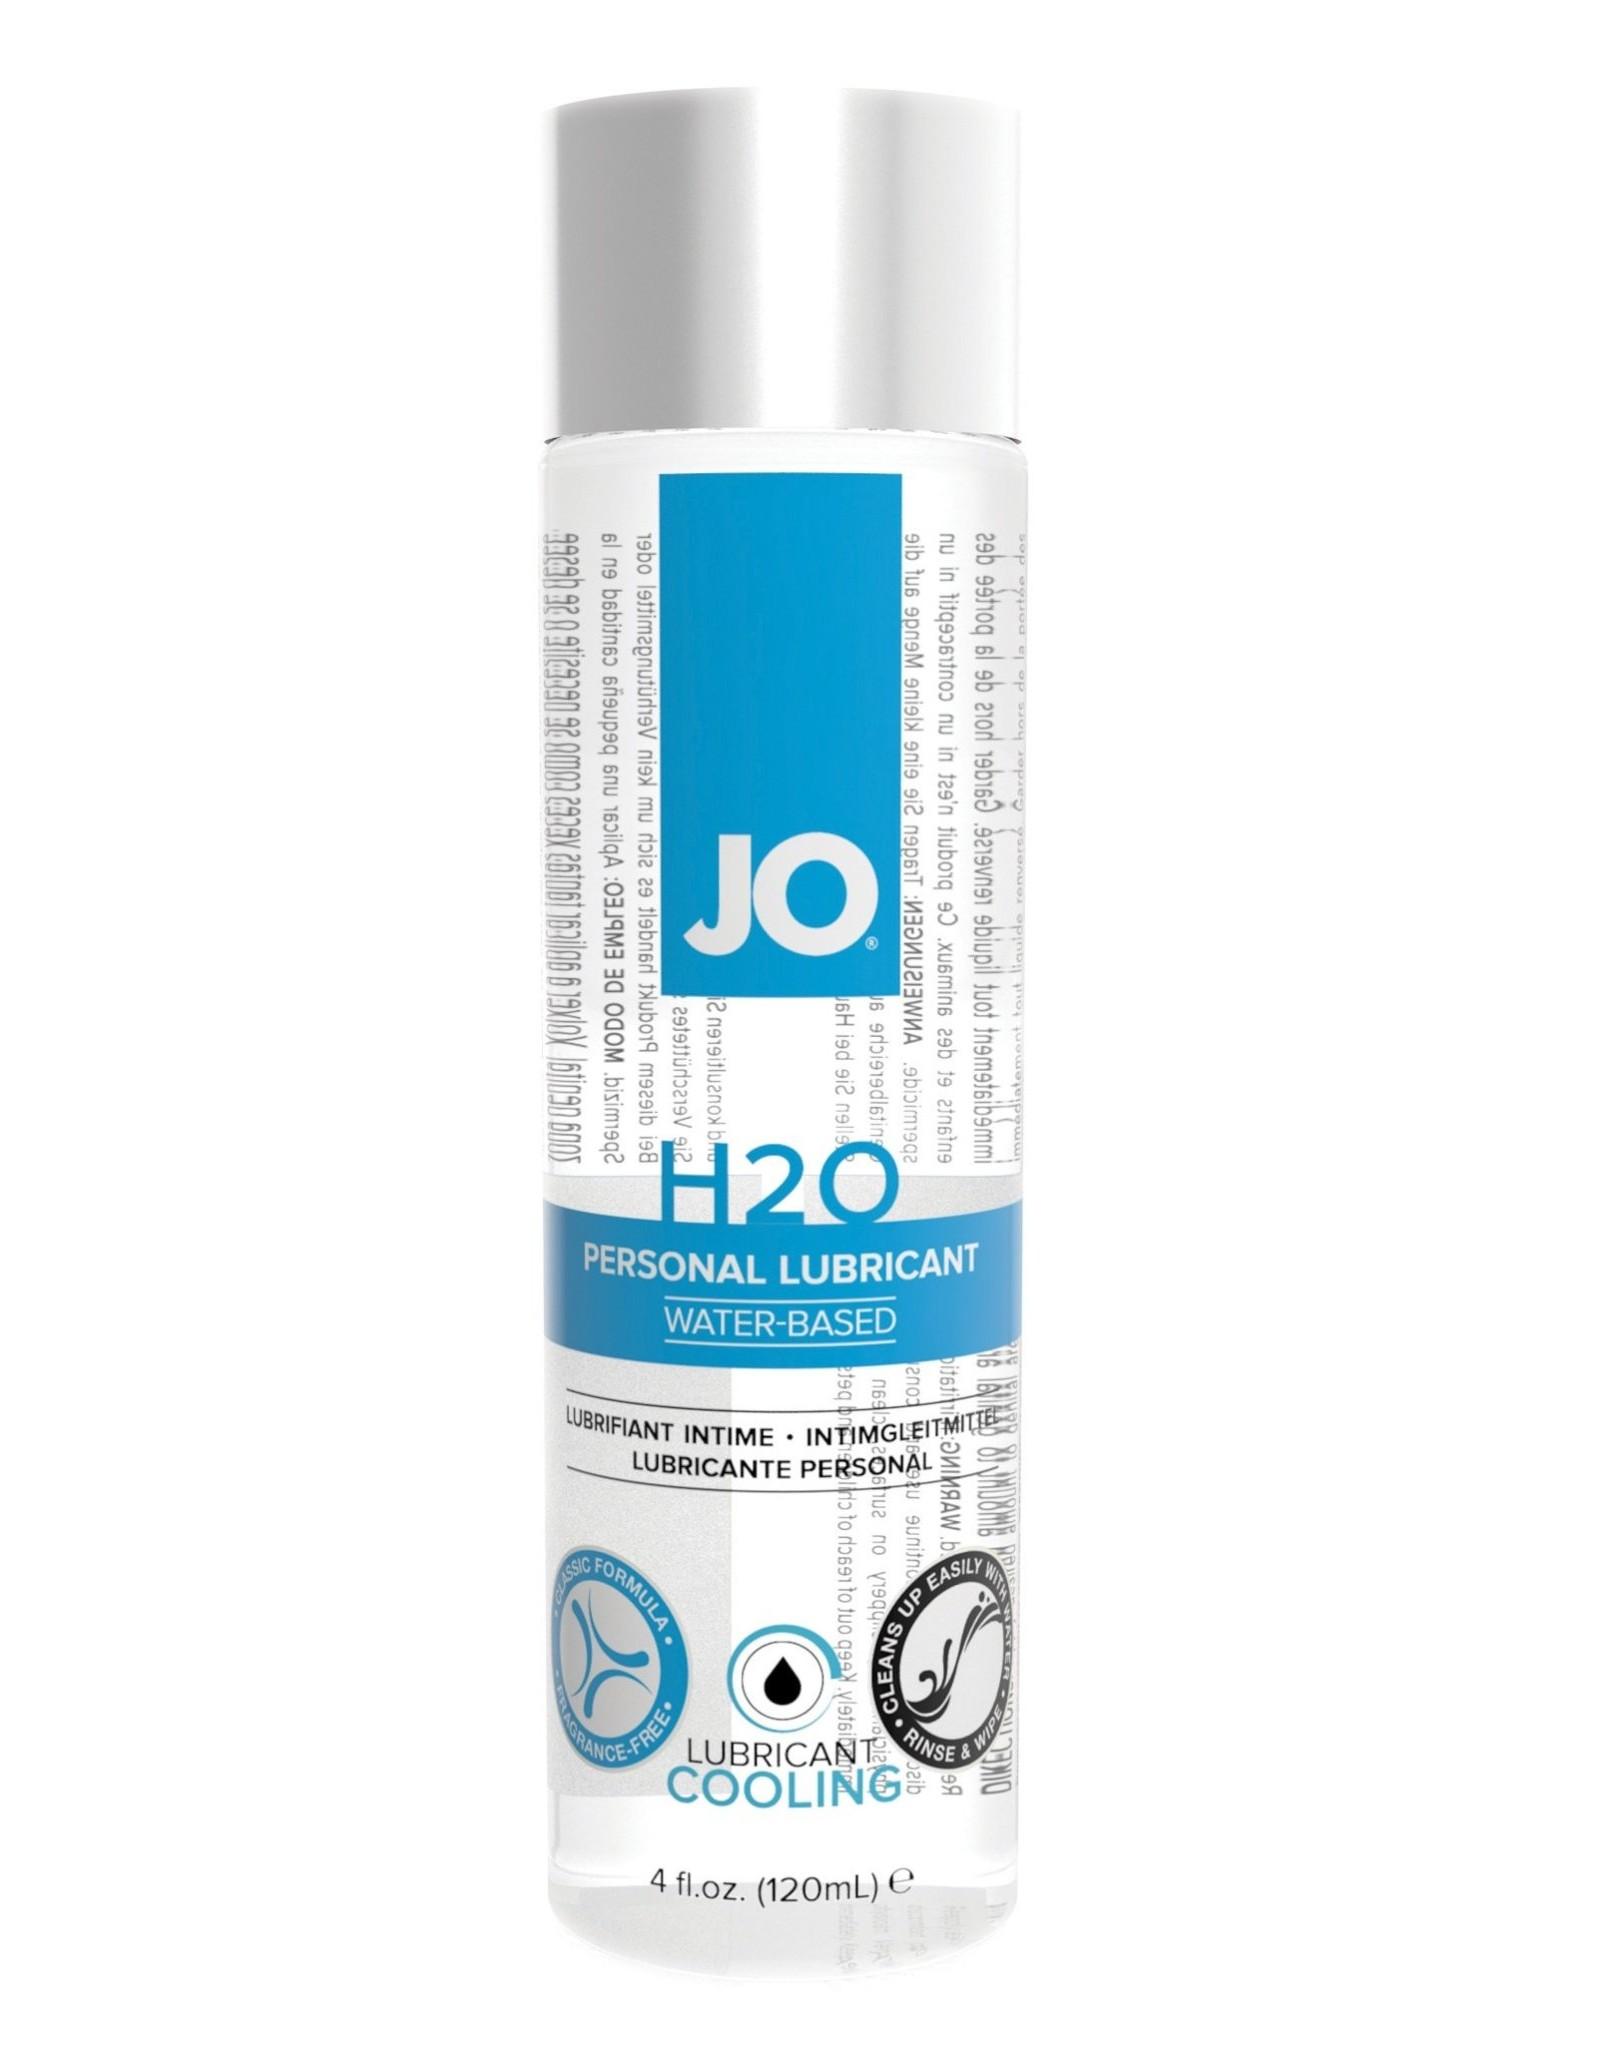 SYSTEM JO JO - H2O WATER BASED LUBE - 120/4OZ